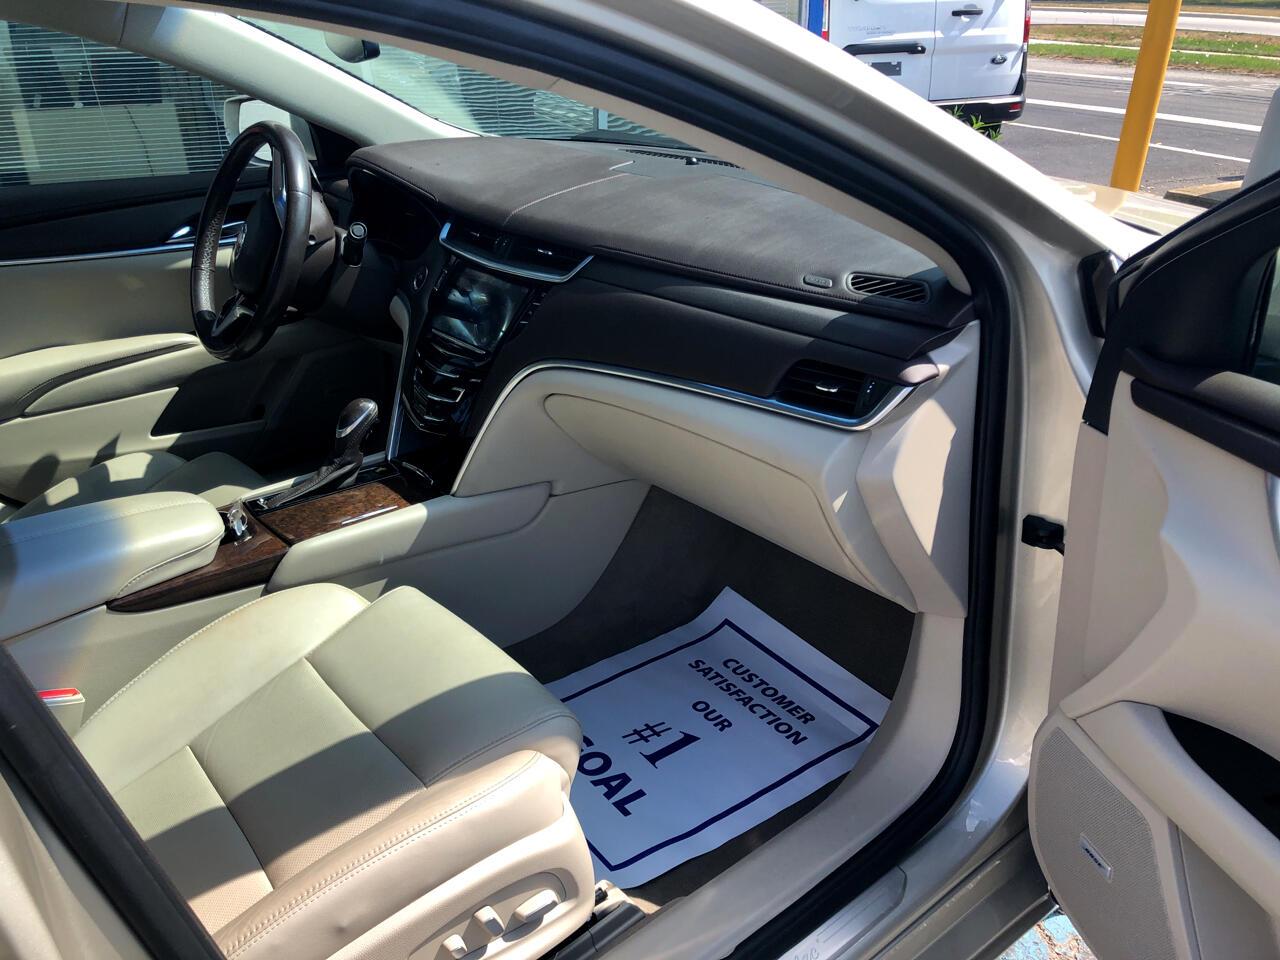 2014 Cadillac XTS Standard FWD